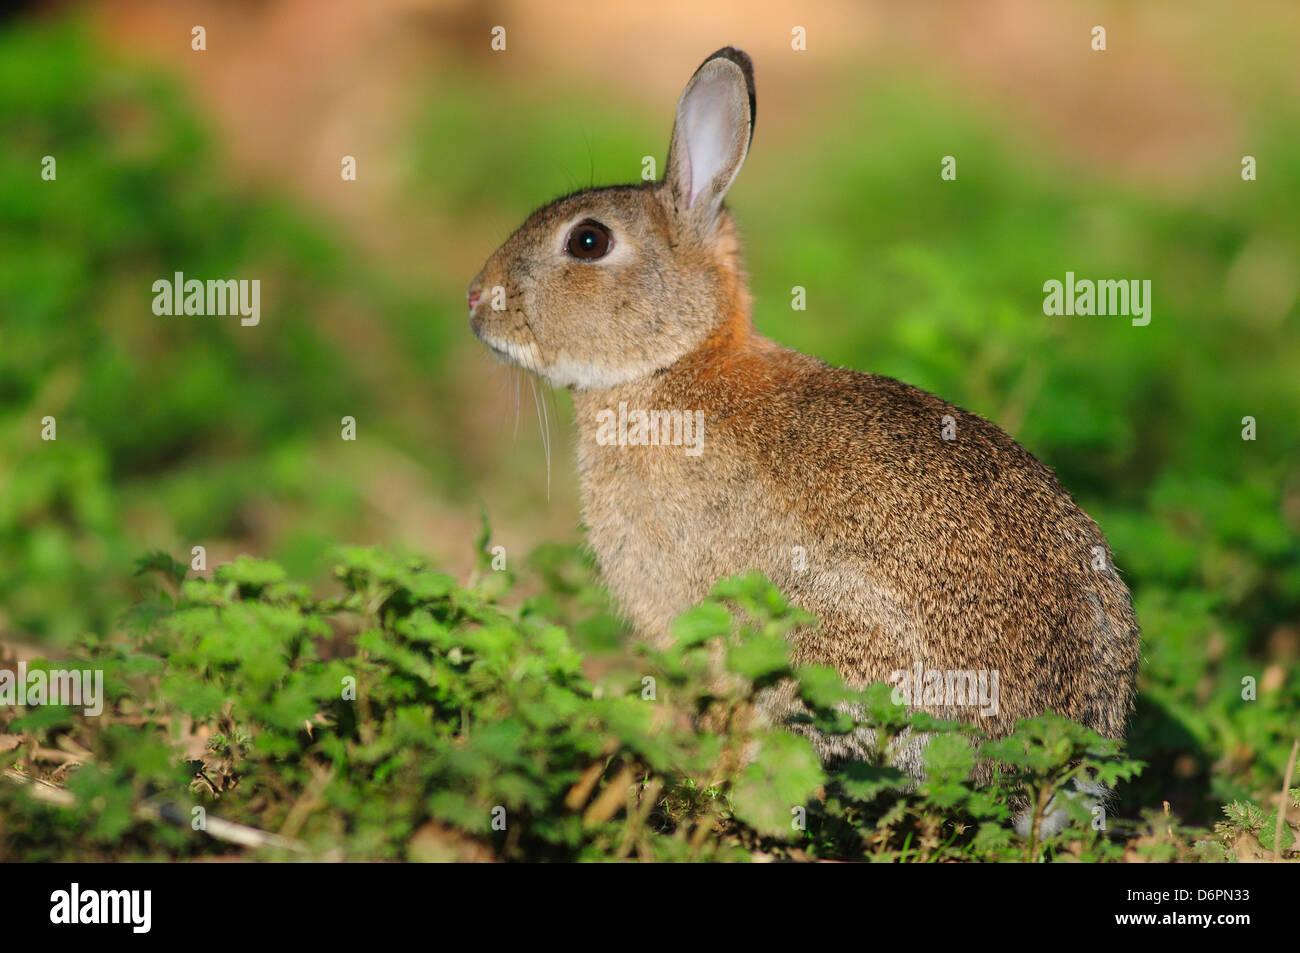 A rabbit in green vegetation - Stock Image